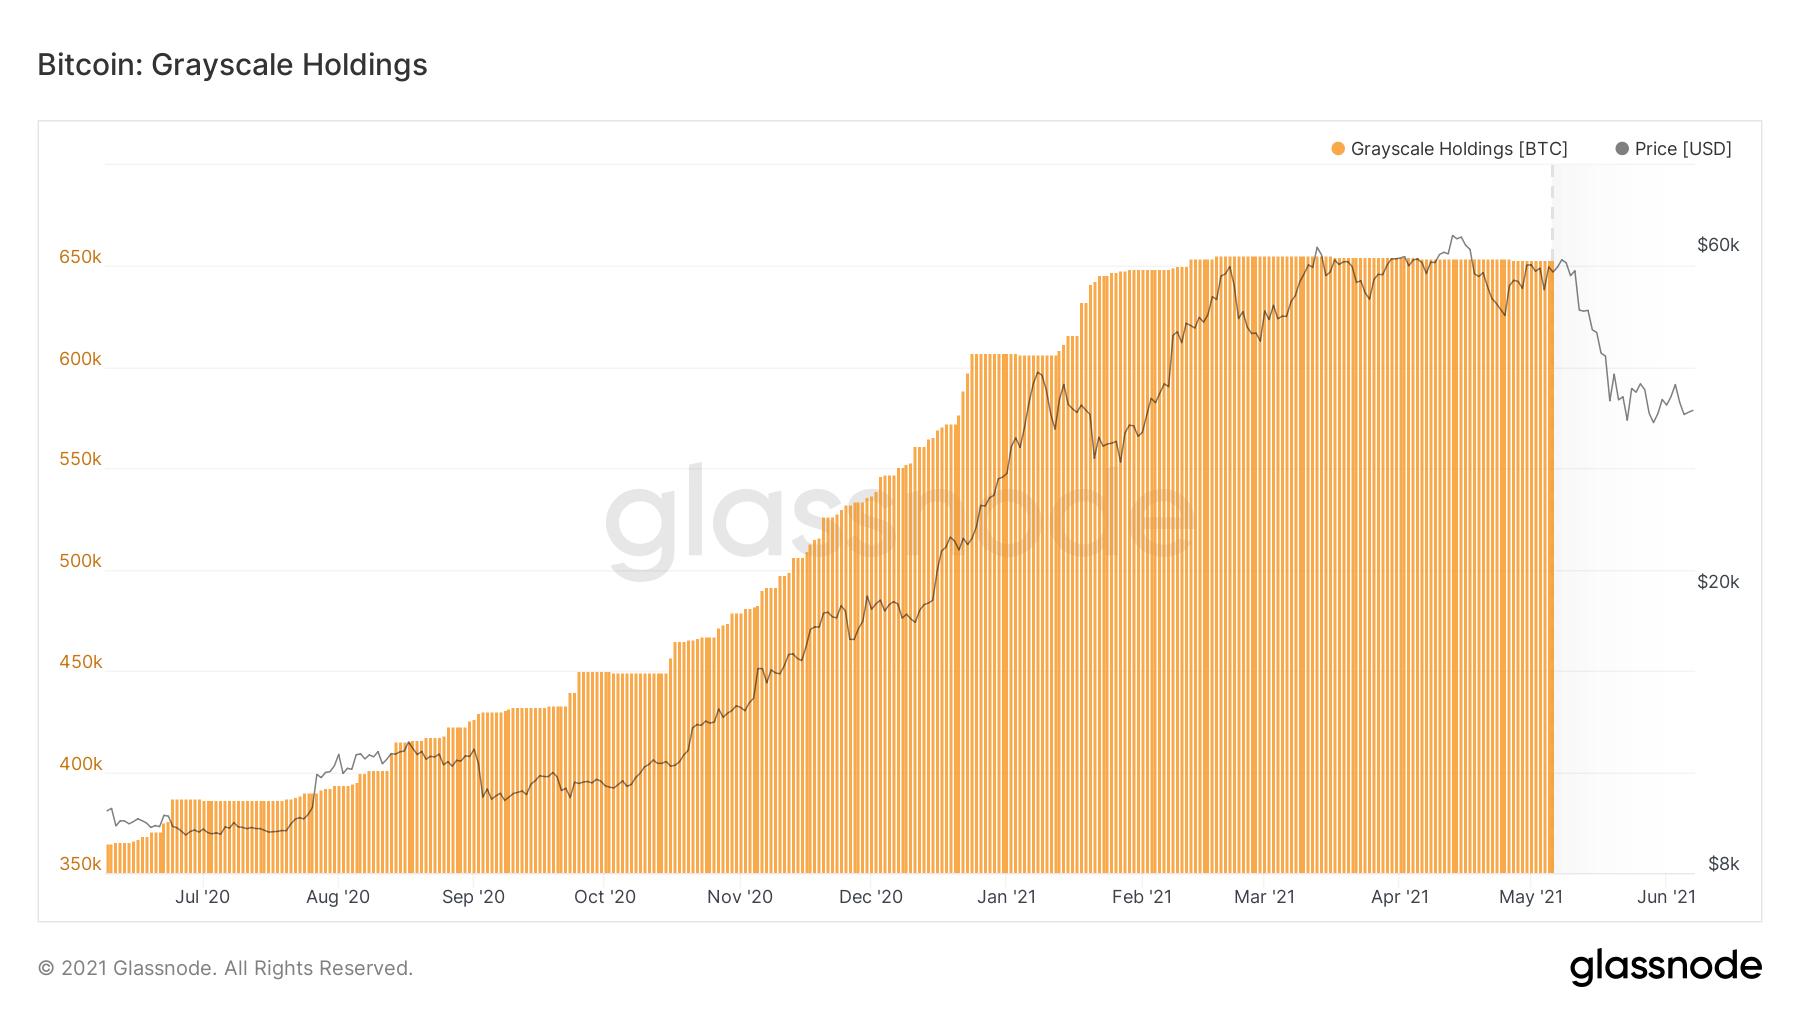 Bitcoin: sentimentul este bearish. GBTC Premium rămâne negativ